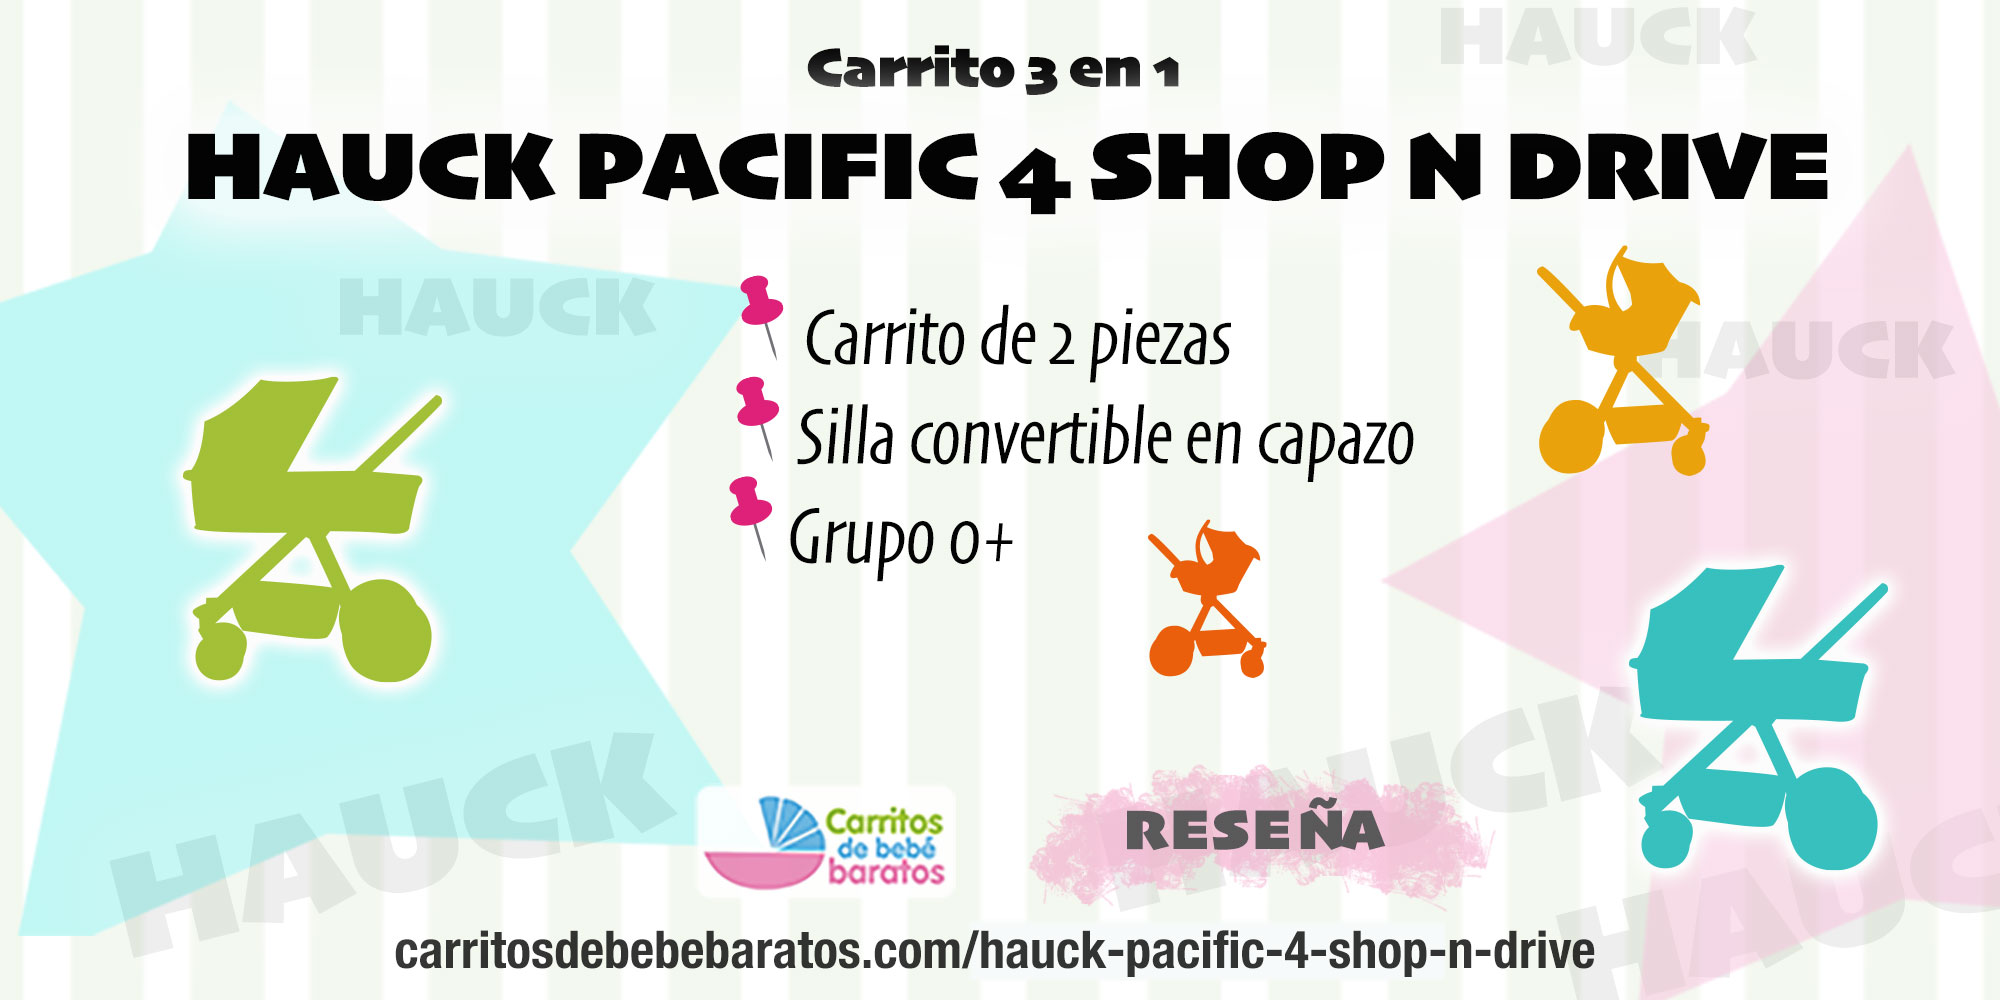 Carrito 3 en 1 Hauck Pacific 4 Shop N Drive